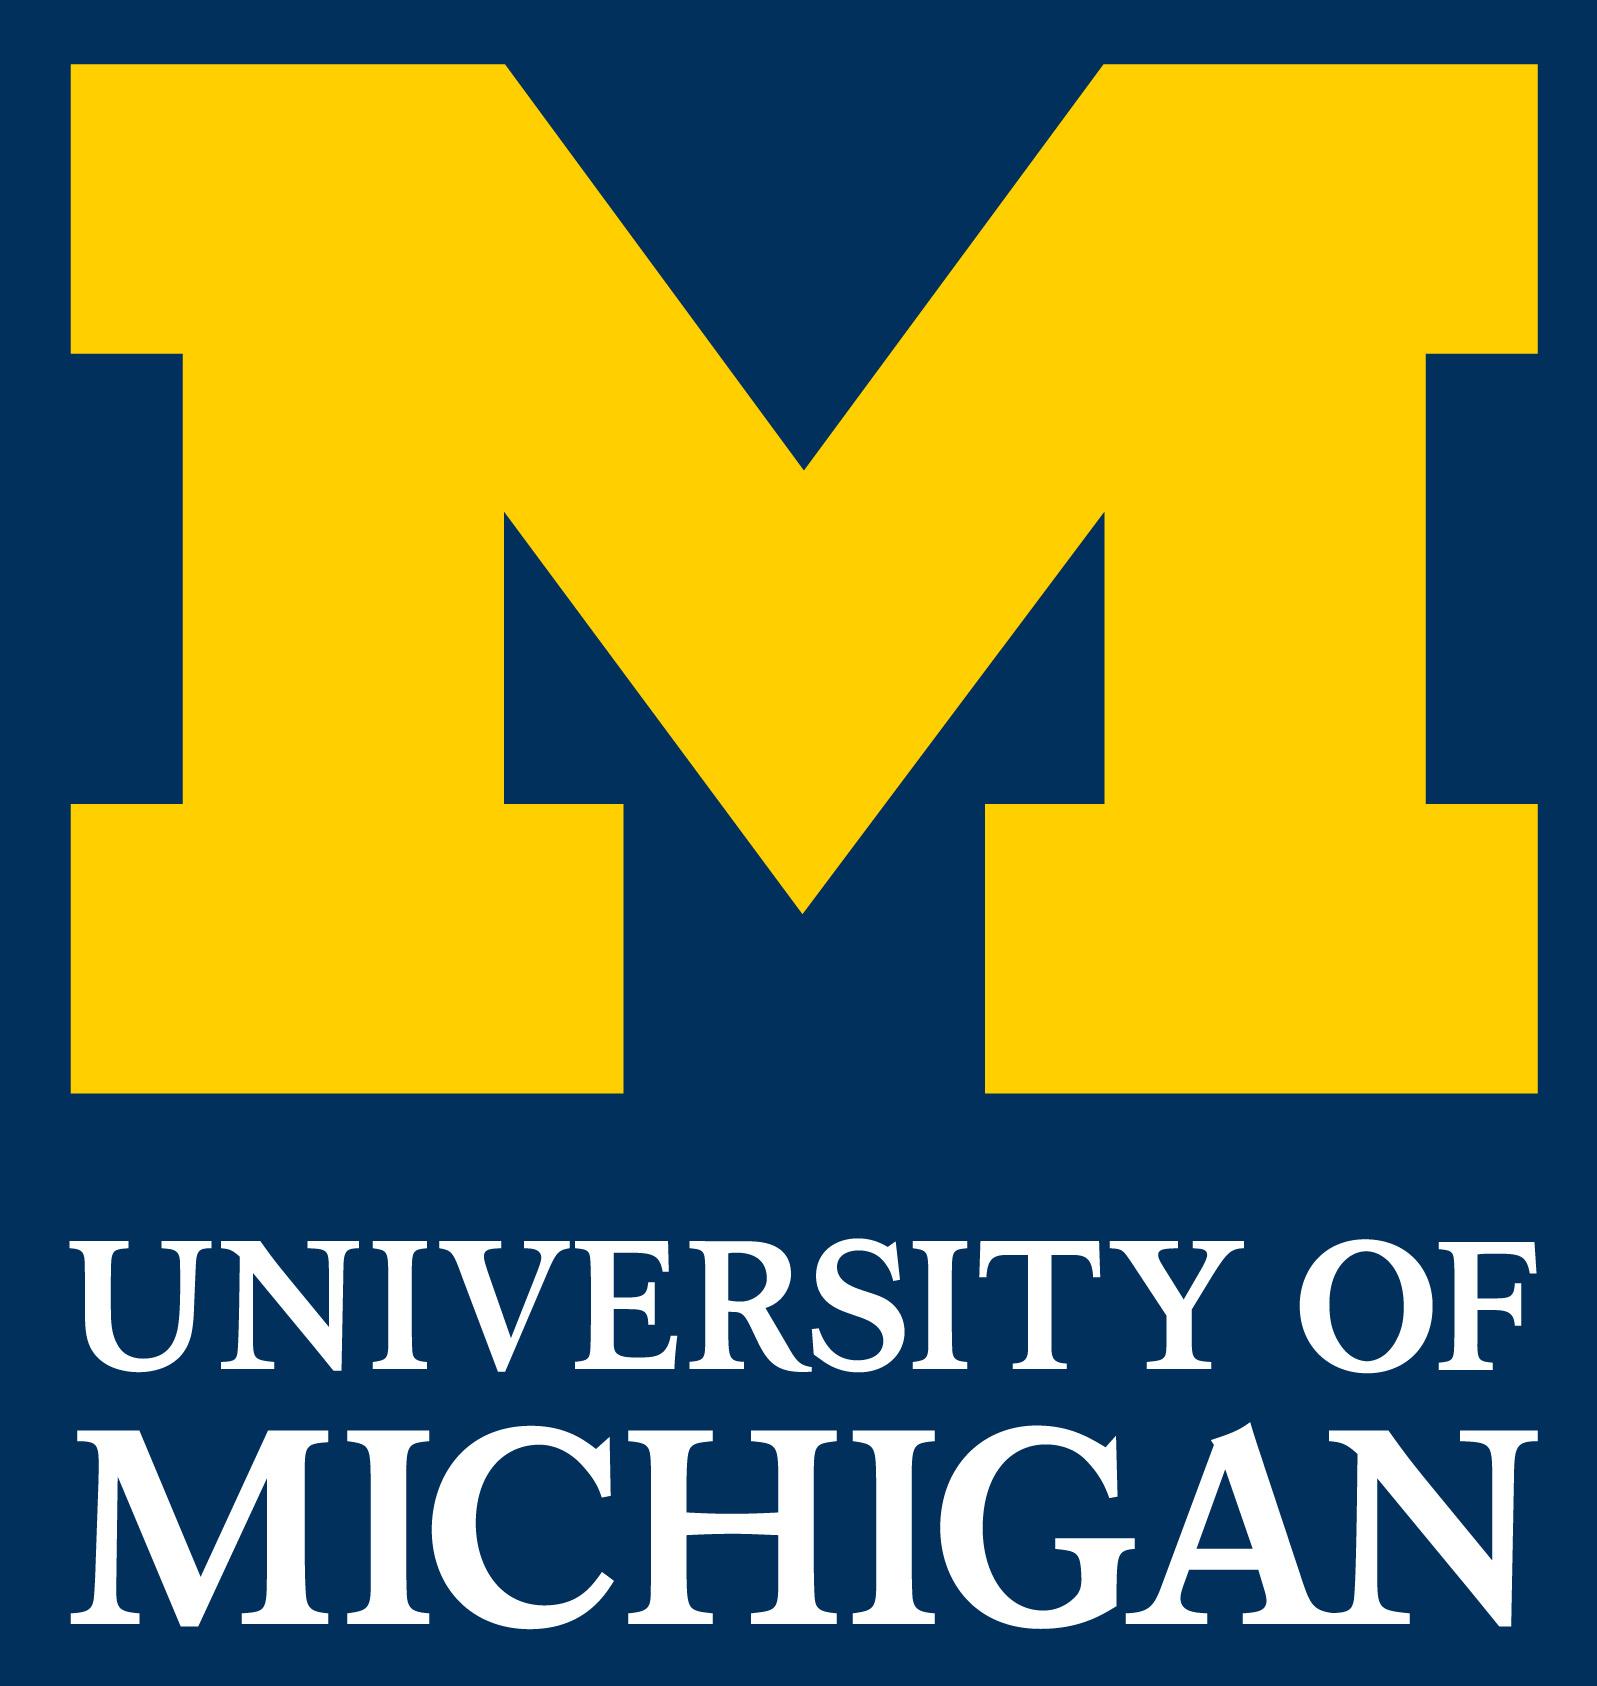 University of Michigan case study